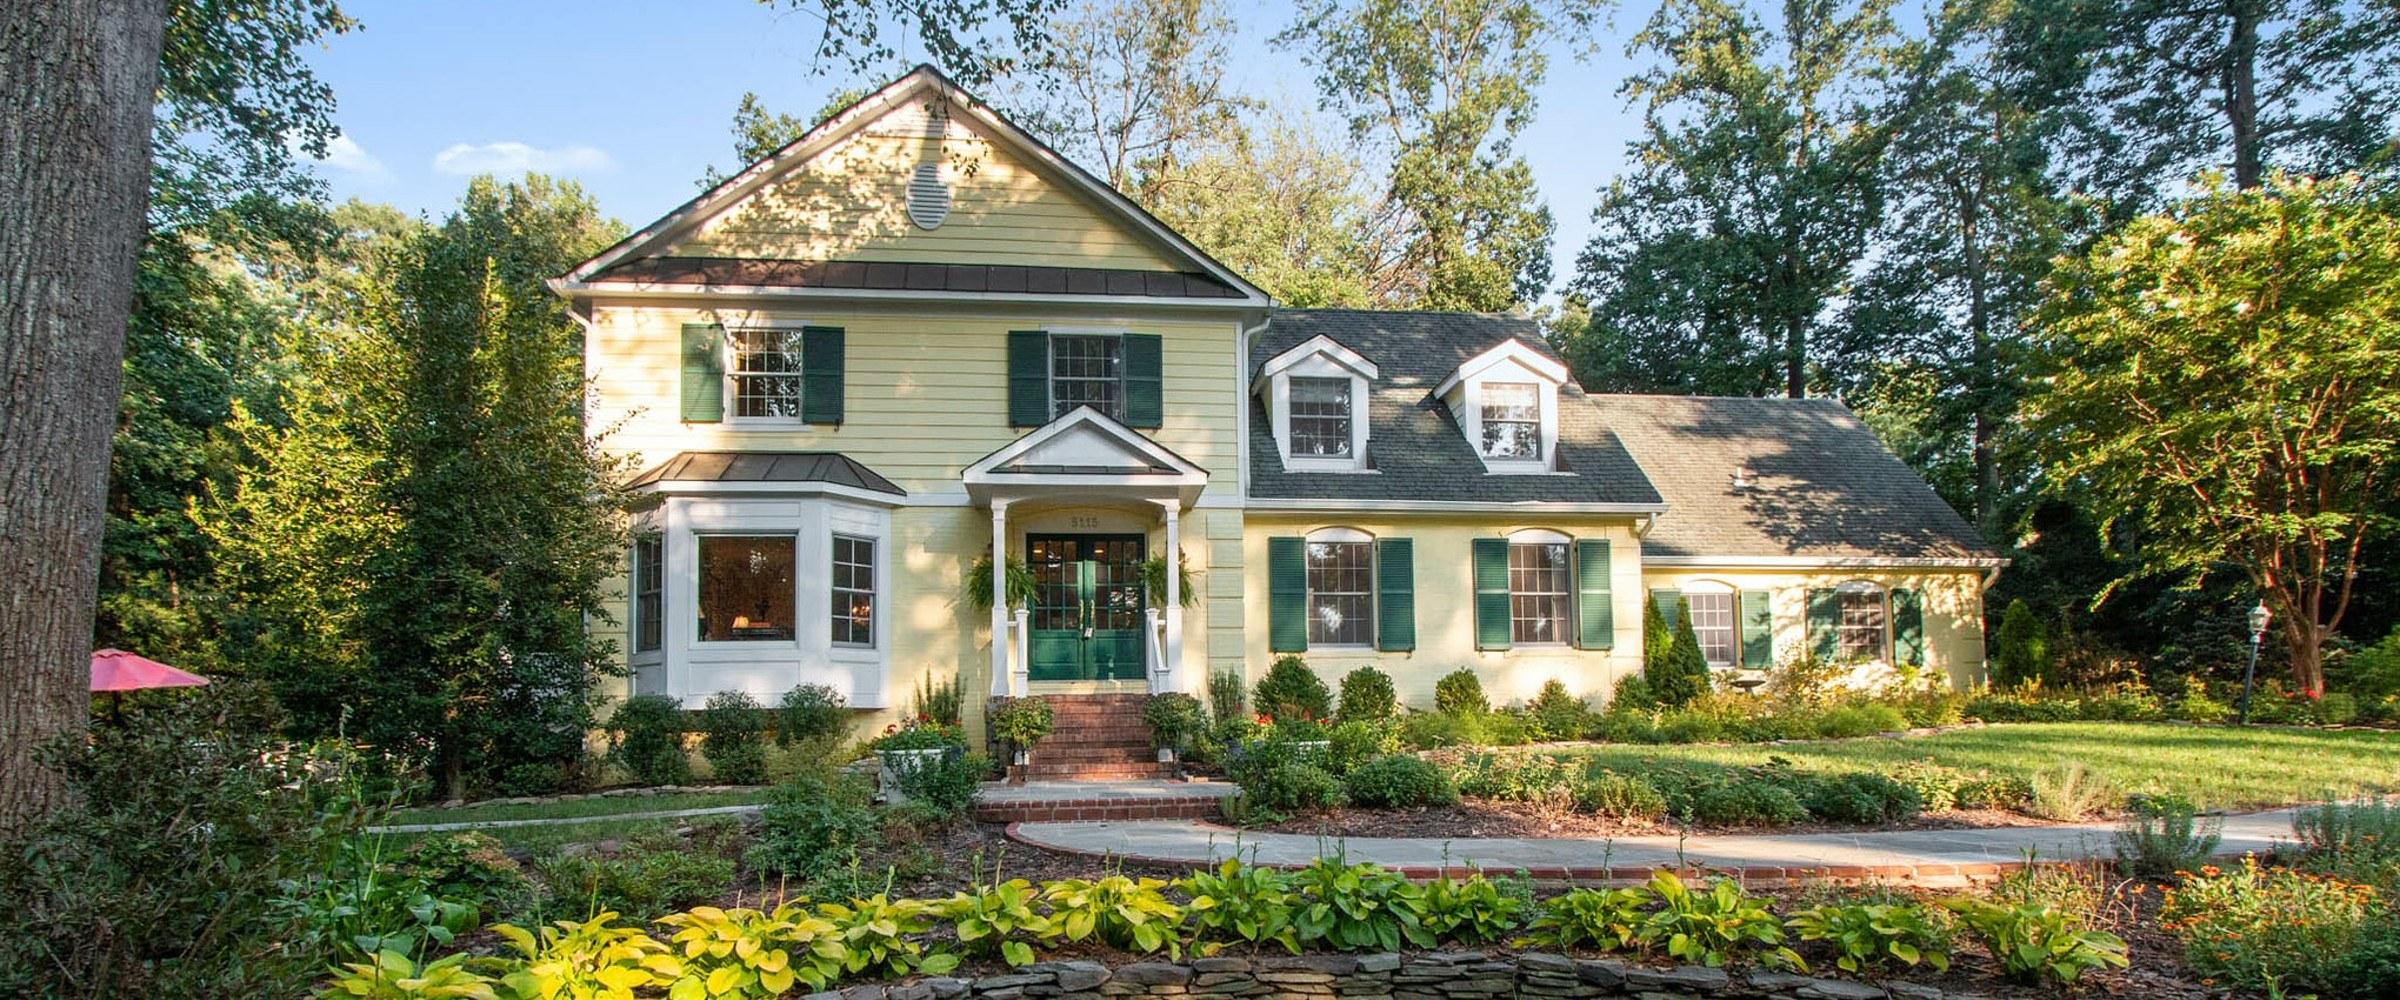 Washington DC Housing Market 2020